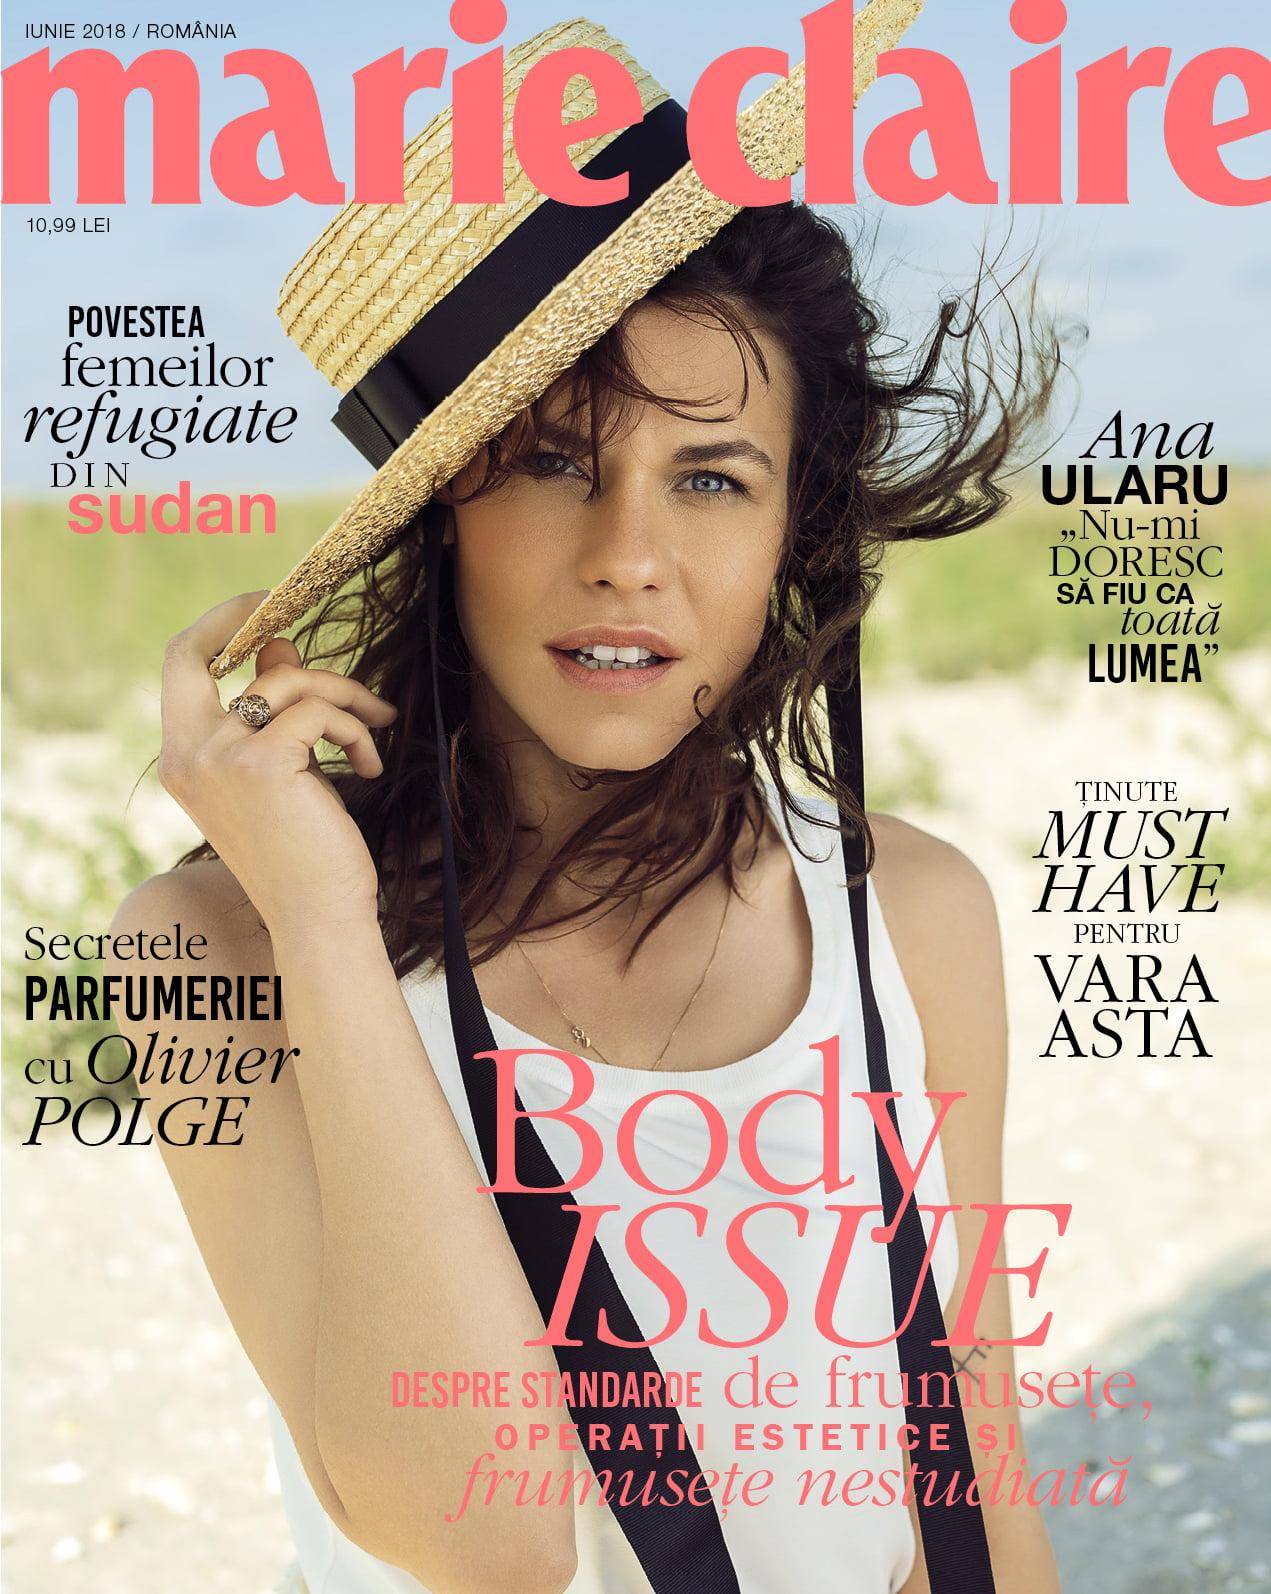 MARIE CLAIRE. JUNE 2018